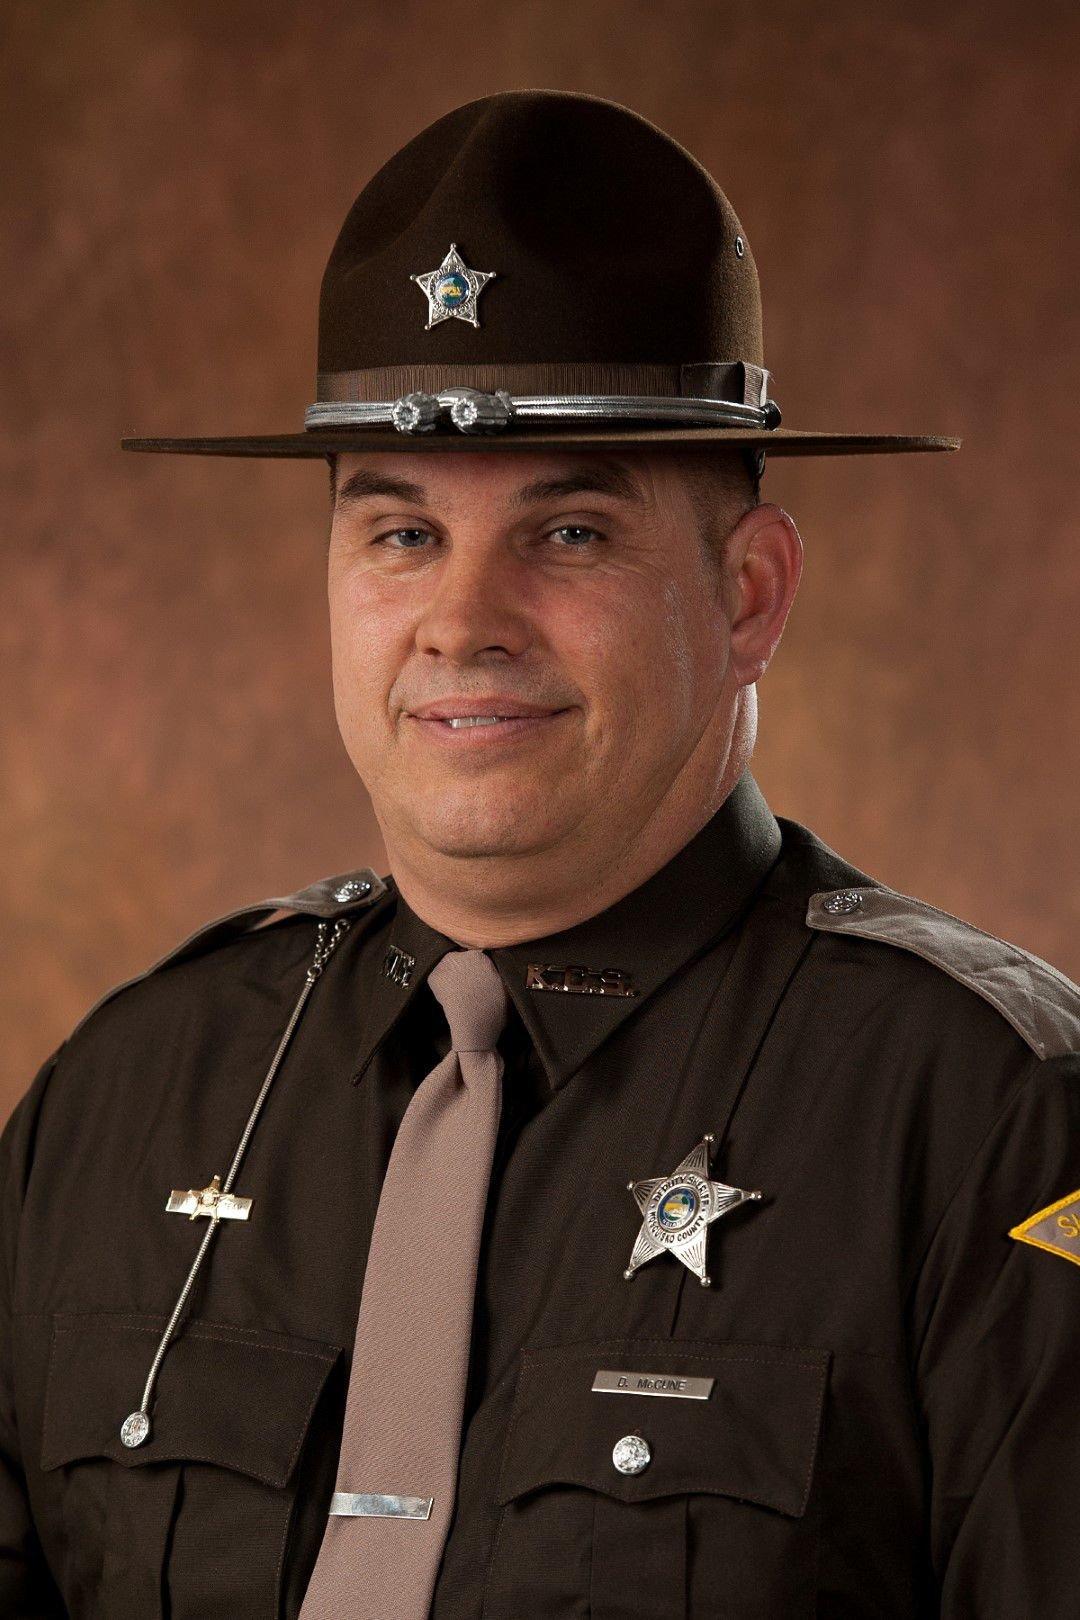 Indiana kosciusko county syracuse - Kosciusko County Officer Men Involved In North Webster Shooting Identified